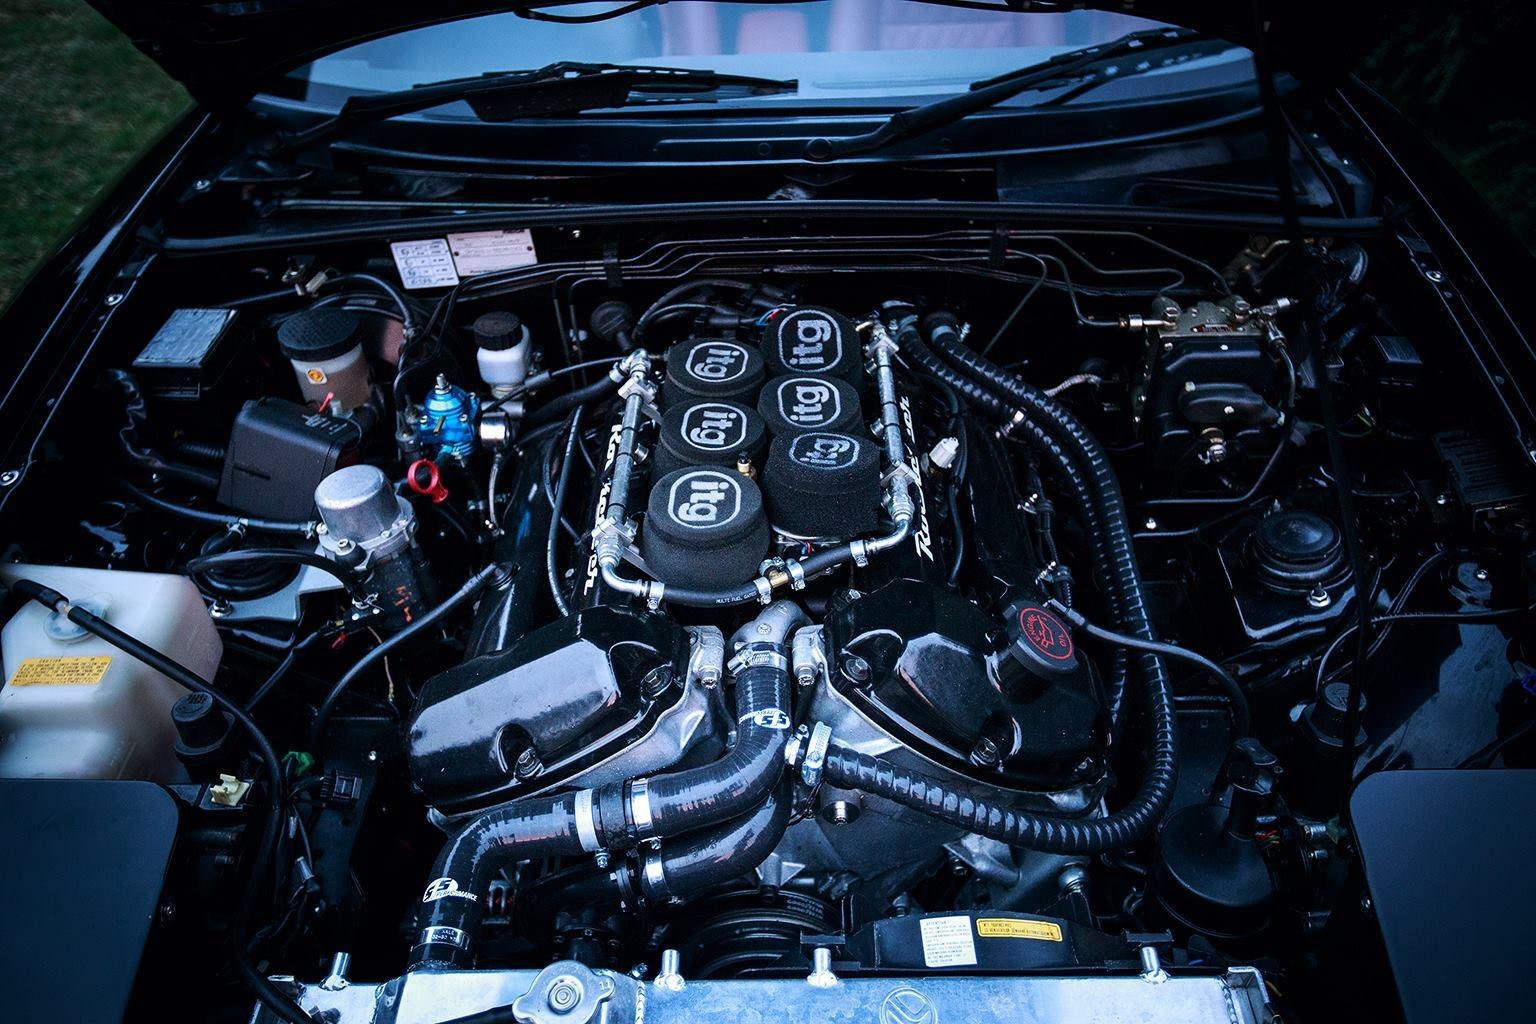 Rocketeer V6 MX-5 3 0 V6 MX5 engine conversion for Mazda MX